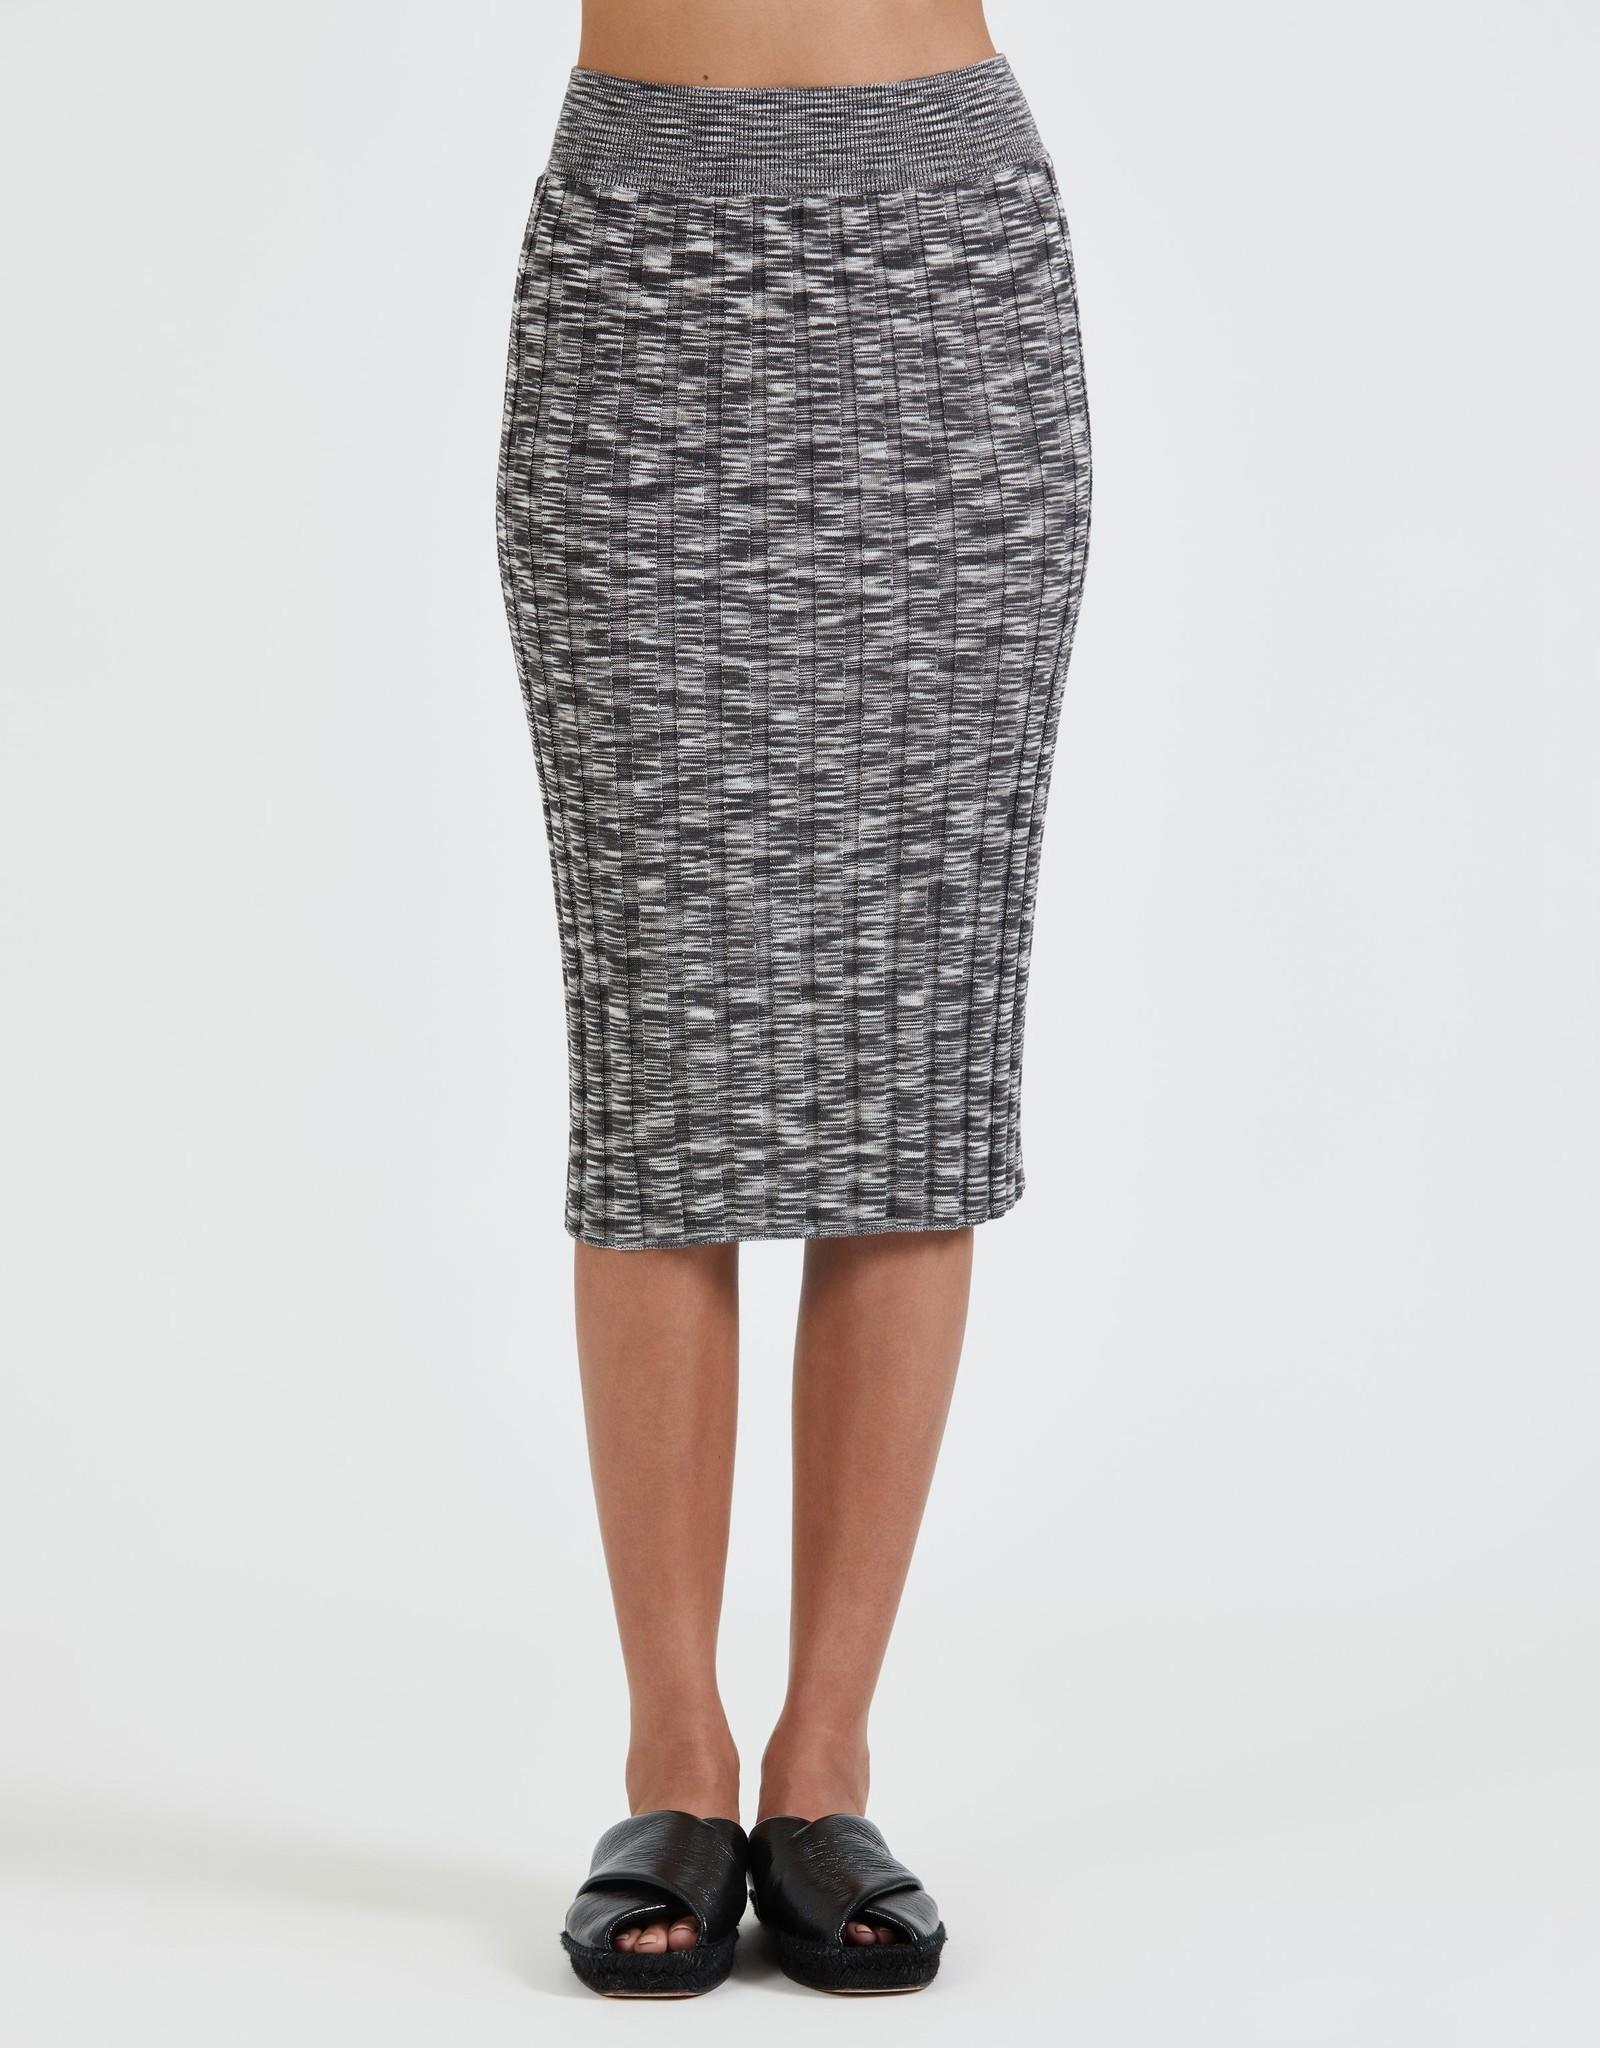 ATM Space Pencil Skirt